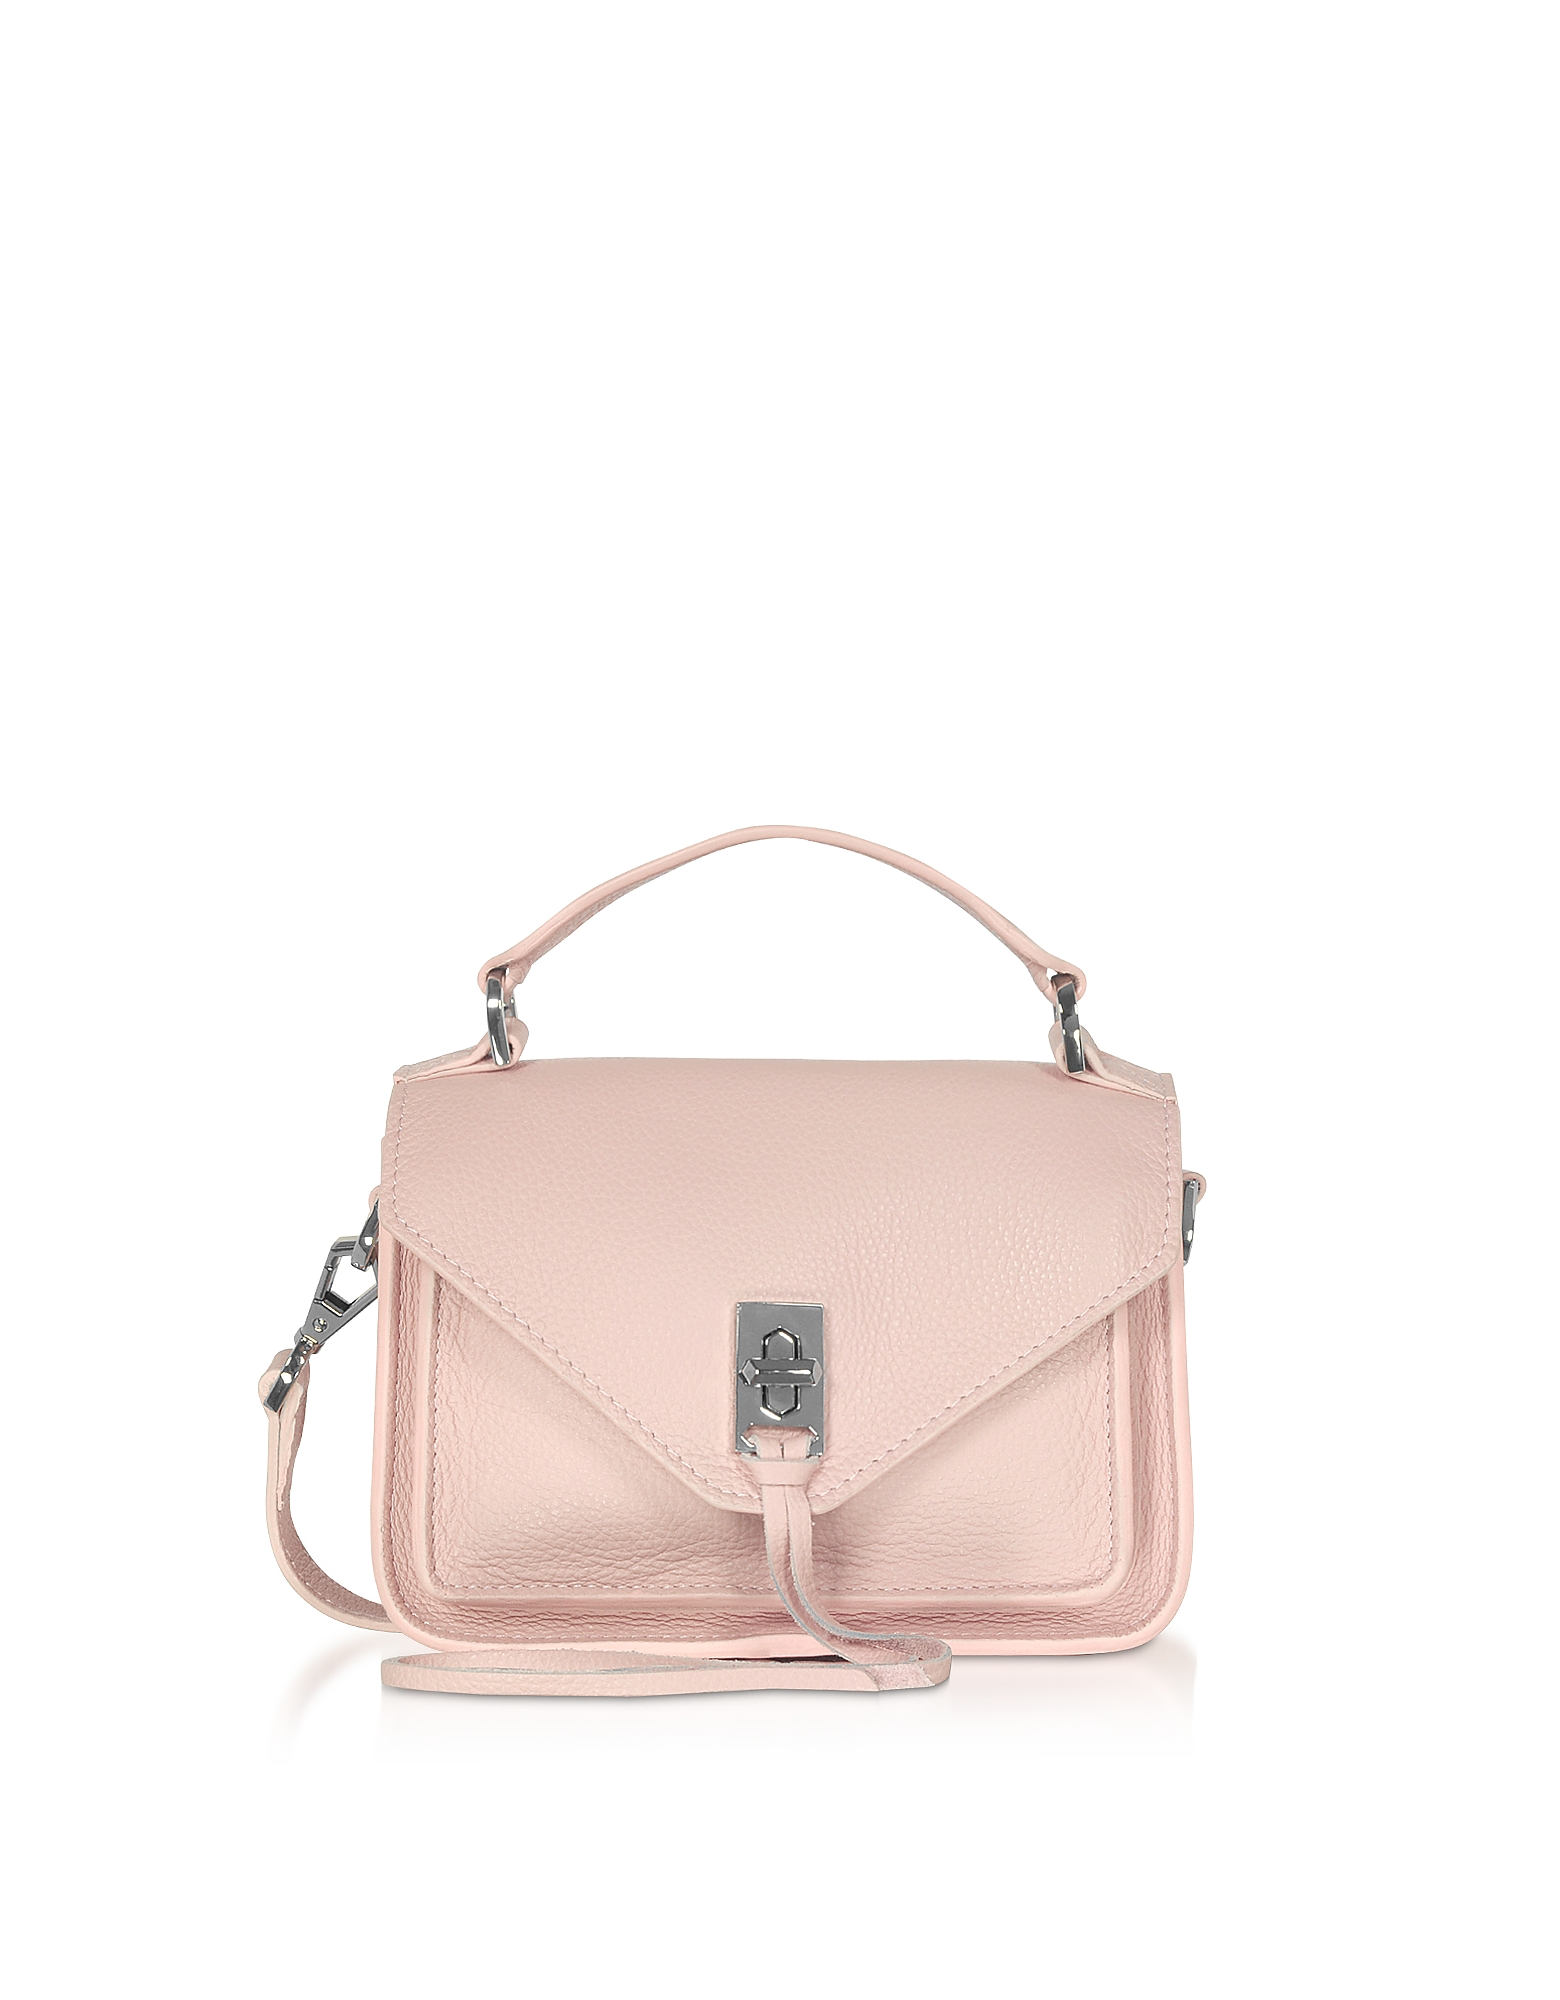 Rebecca Minkoff Designer Handbags, Pebble Leather Mini Darren Messenger Bag